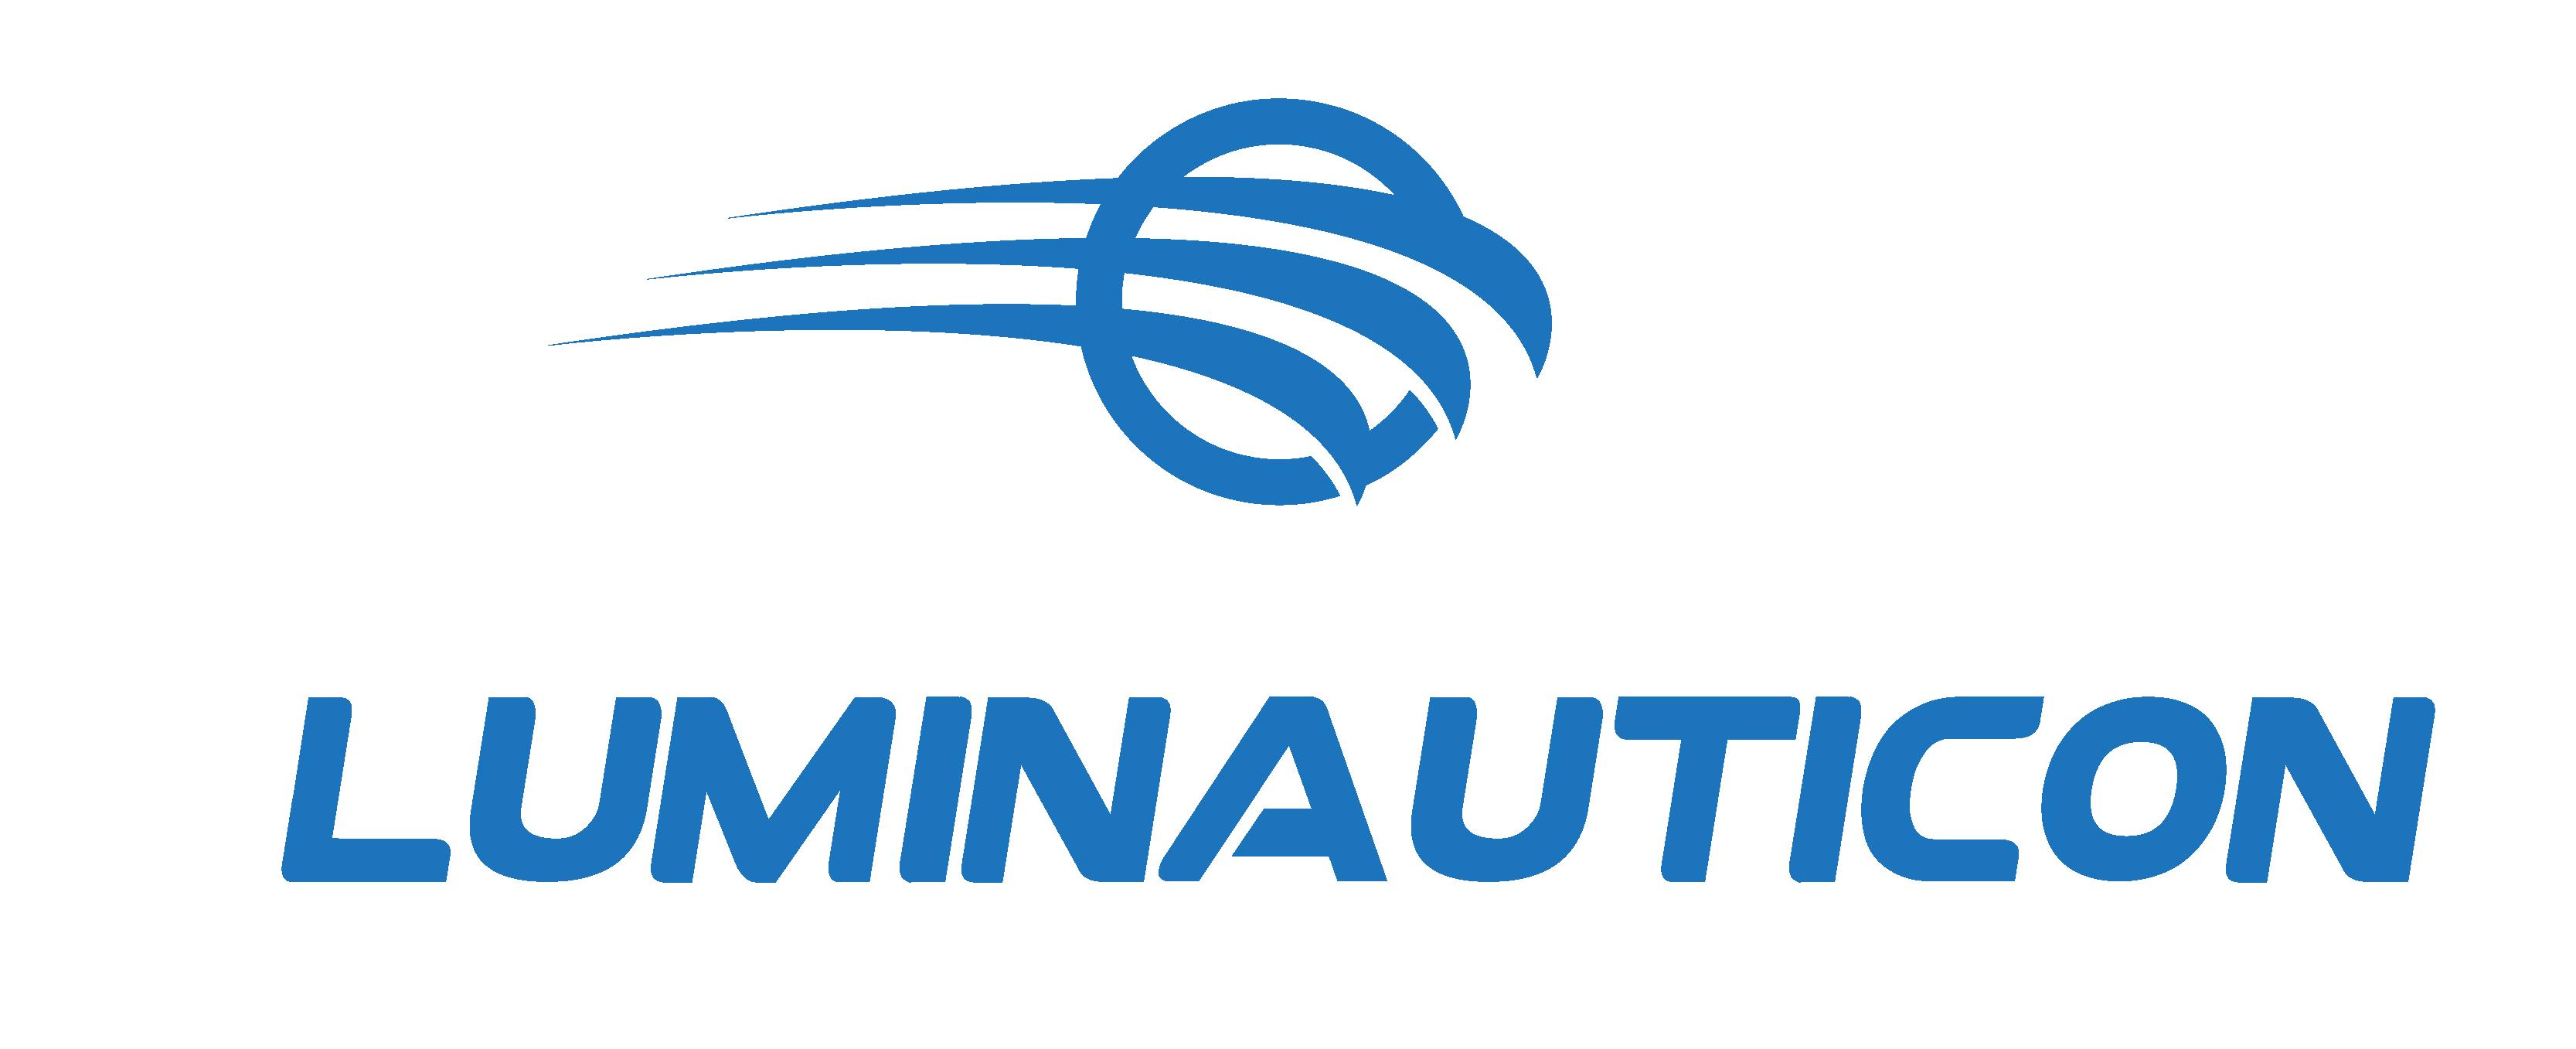 Luminauticon-Icon.png